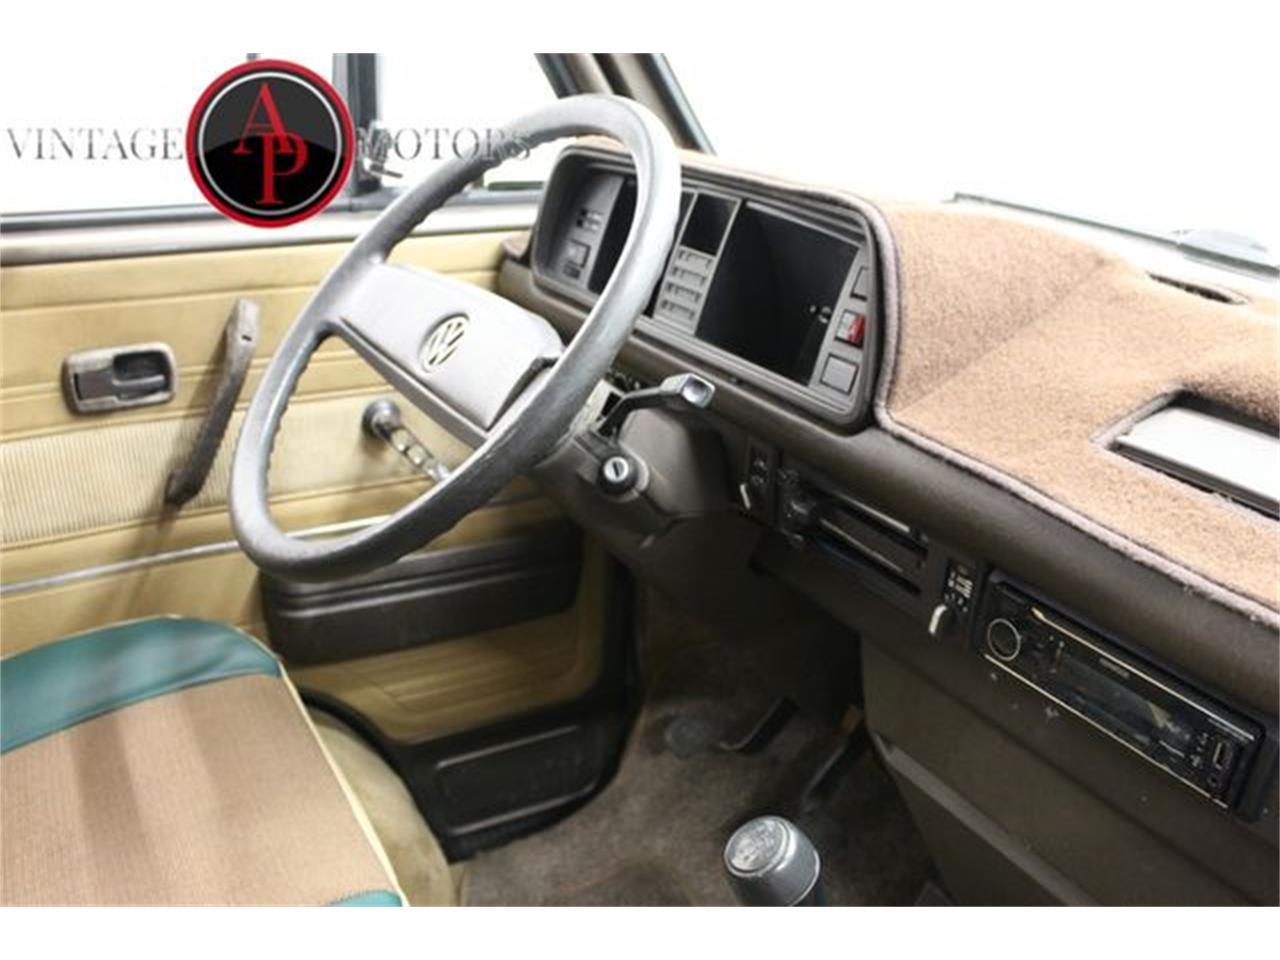 1986 Volkswagen Vanagon (CC-1420219) for sale in Statesville, North Carolina